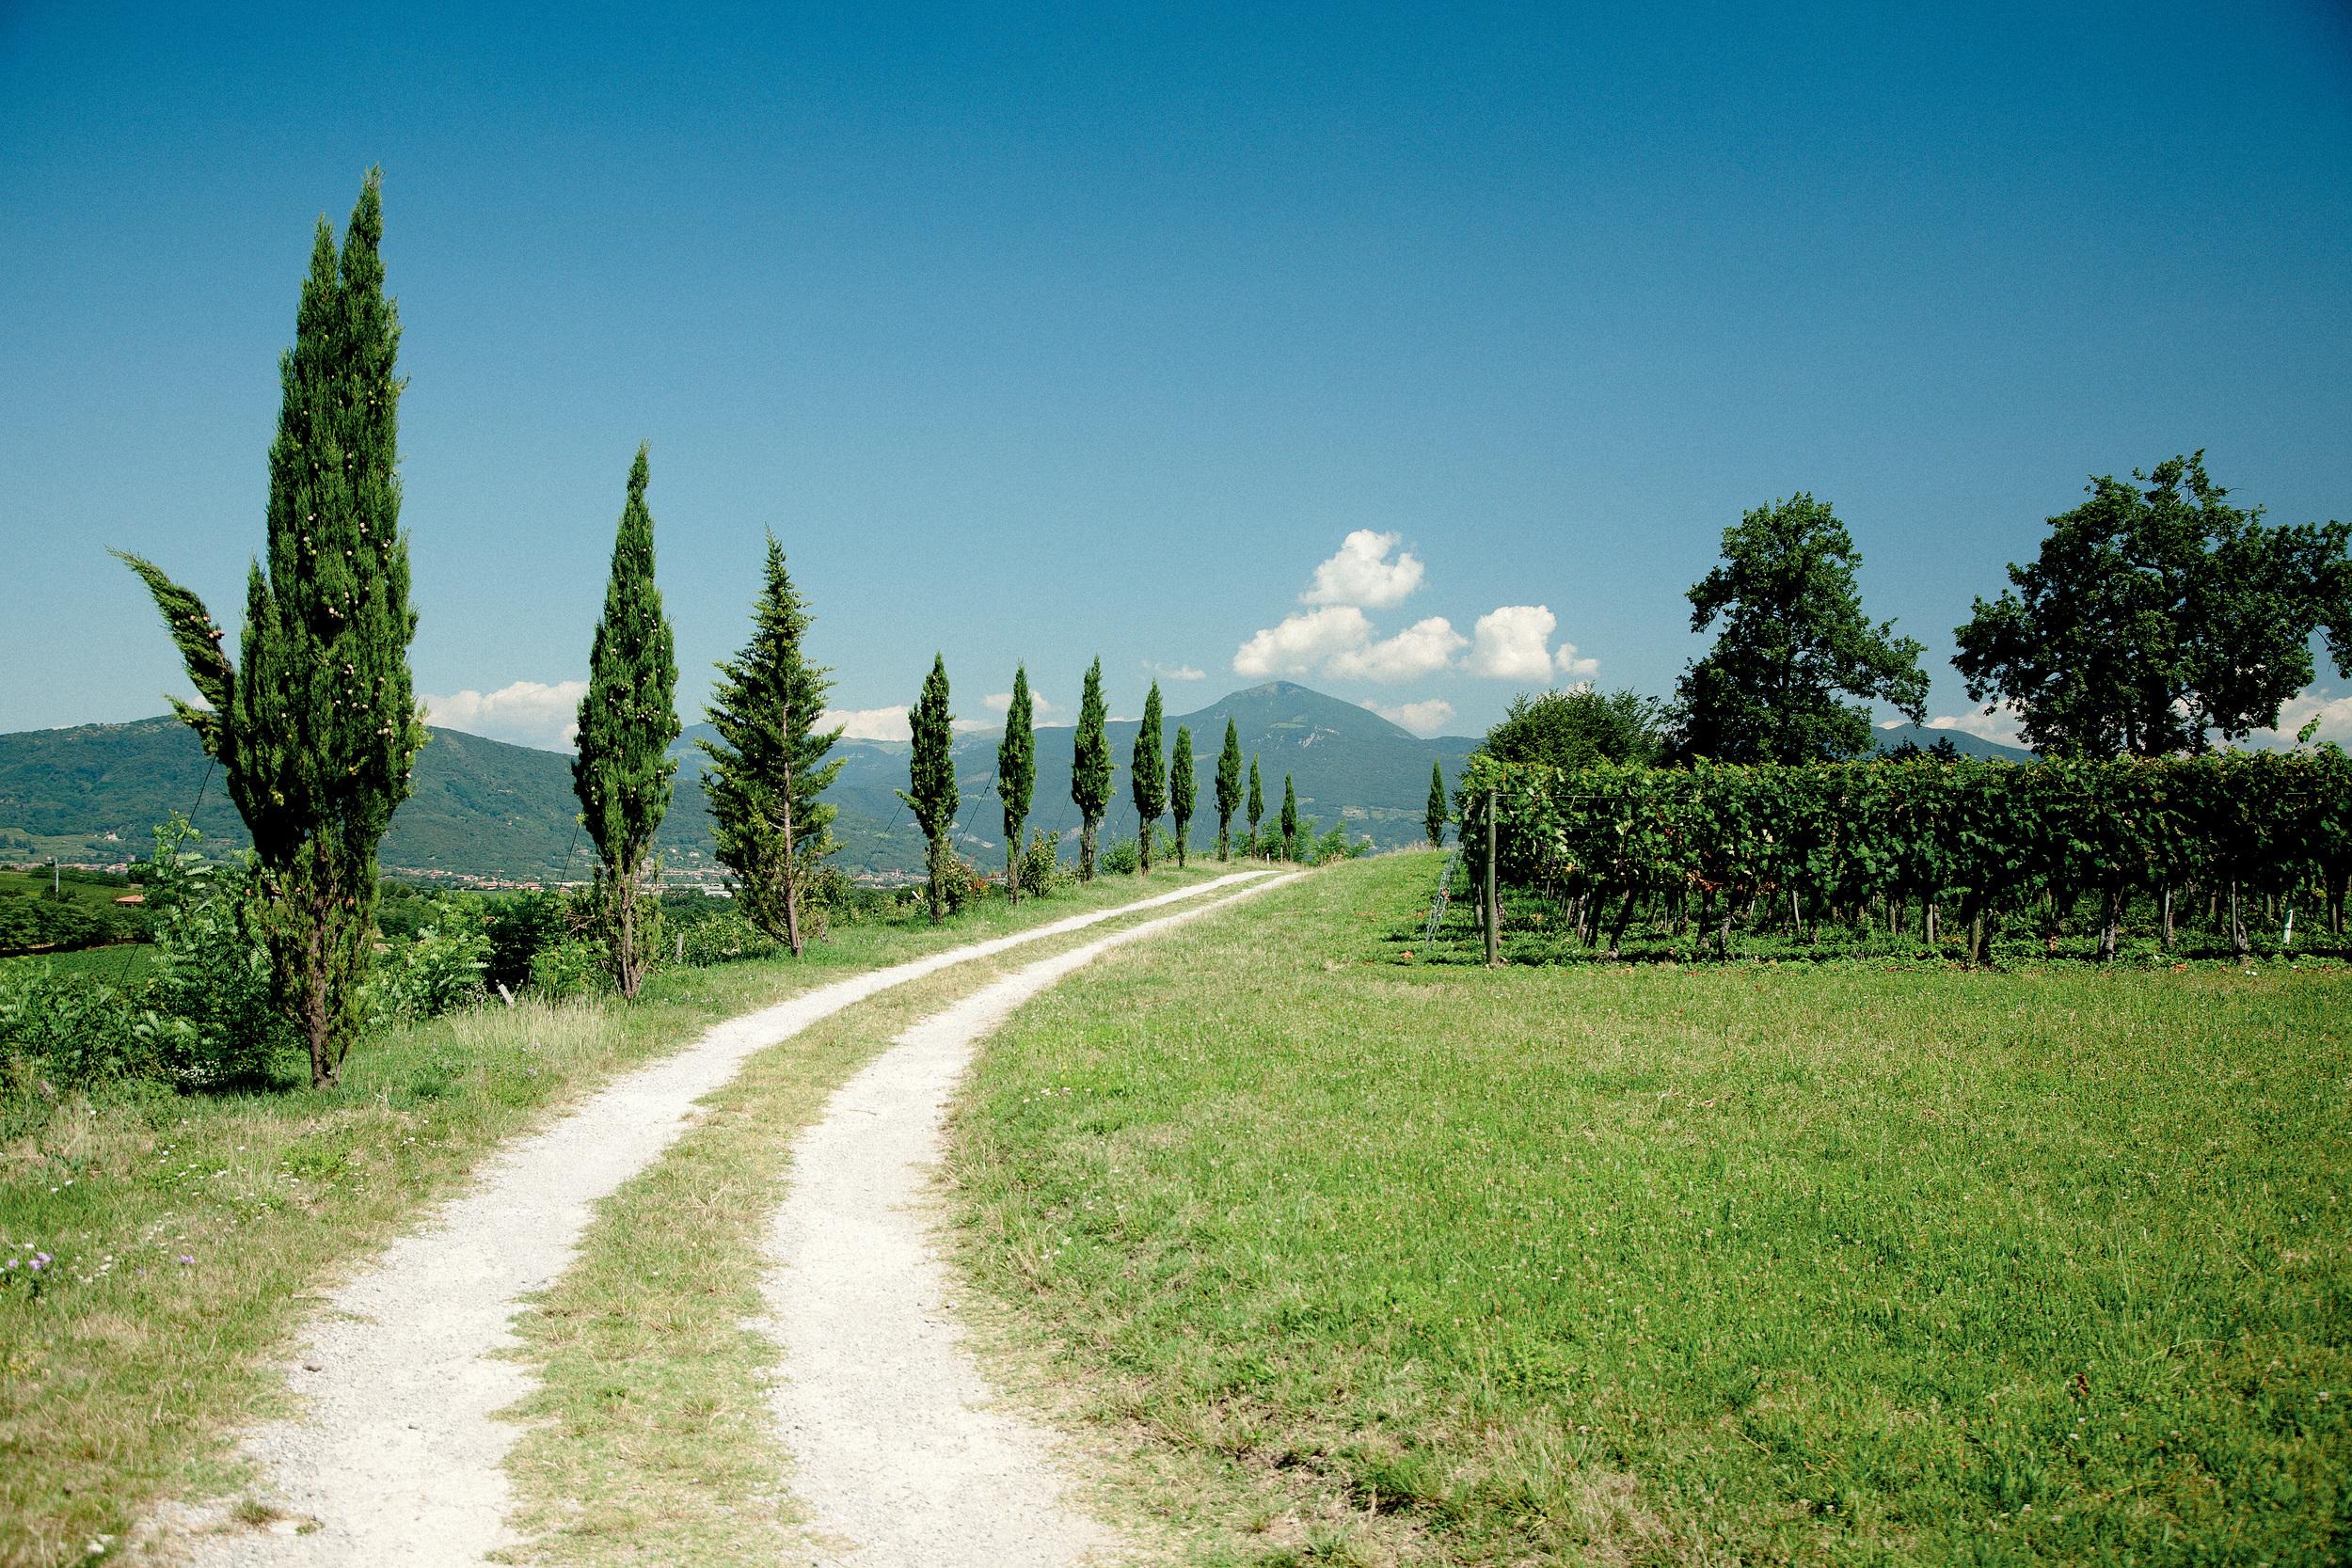 Route to Franciacorta | Photo Credit: Artamonov Timor